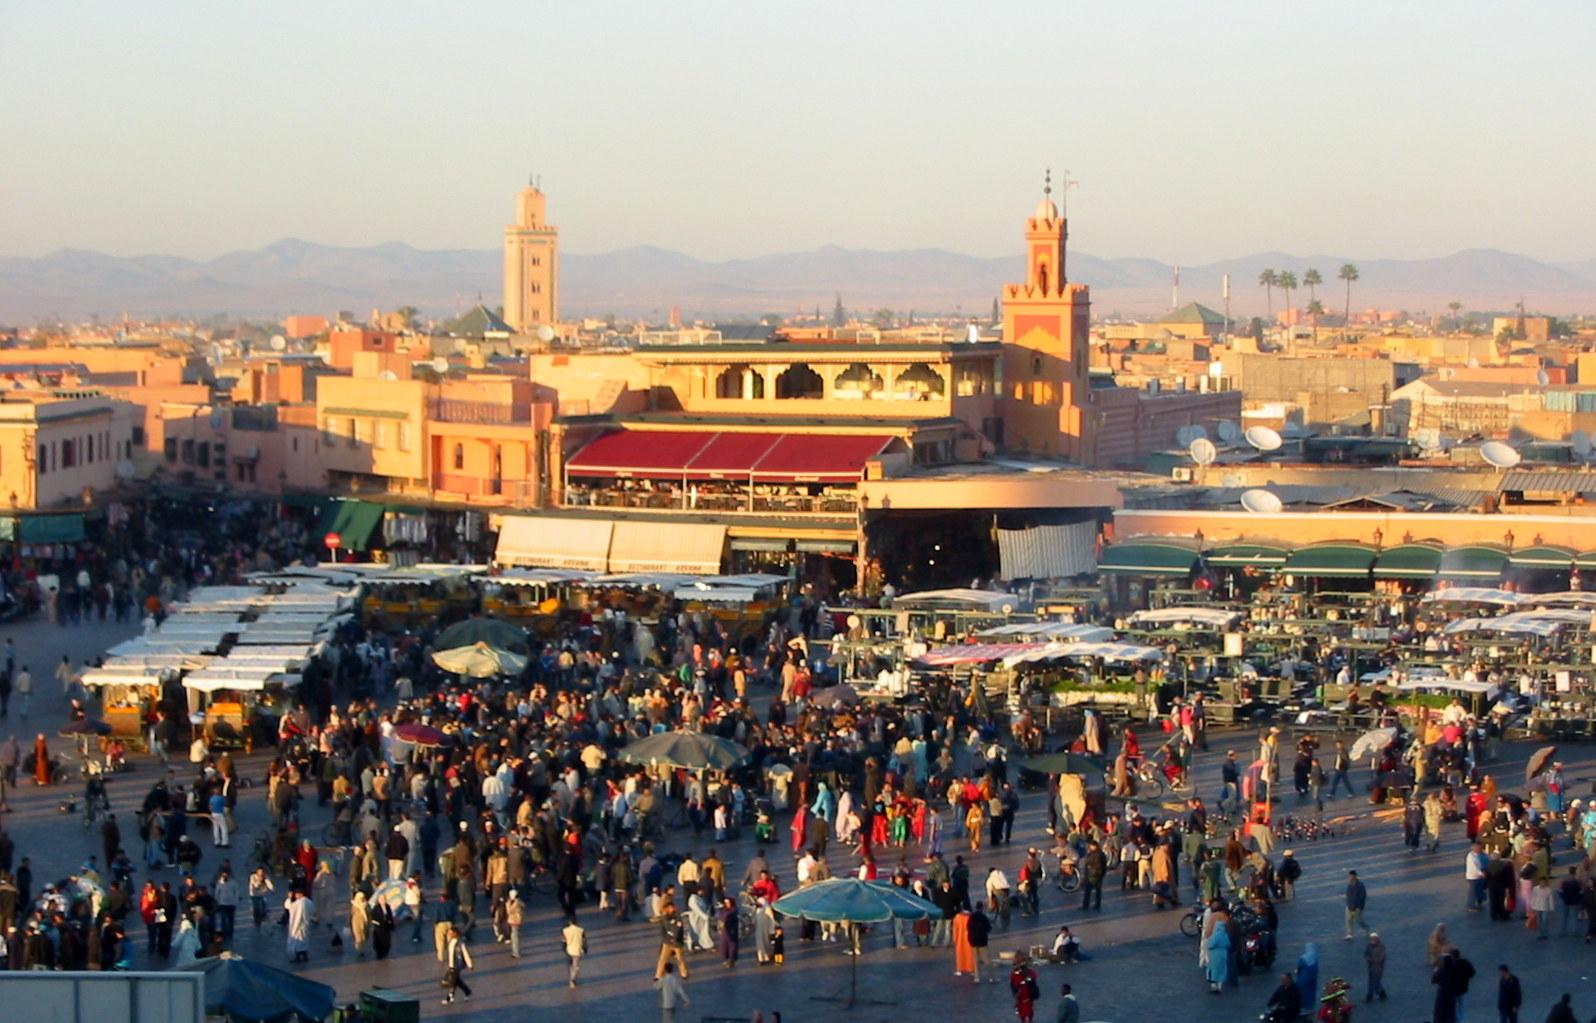 Marrakech piazza Djemaa el-Fna